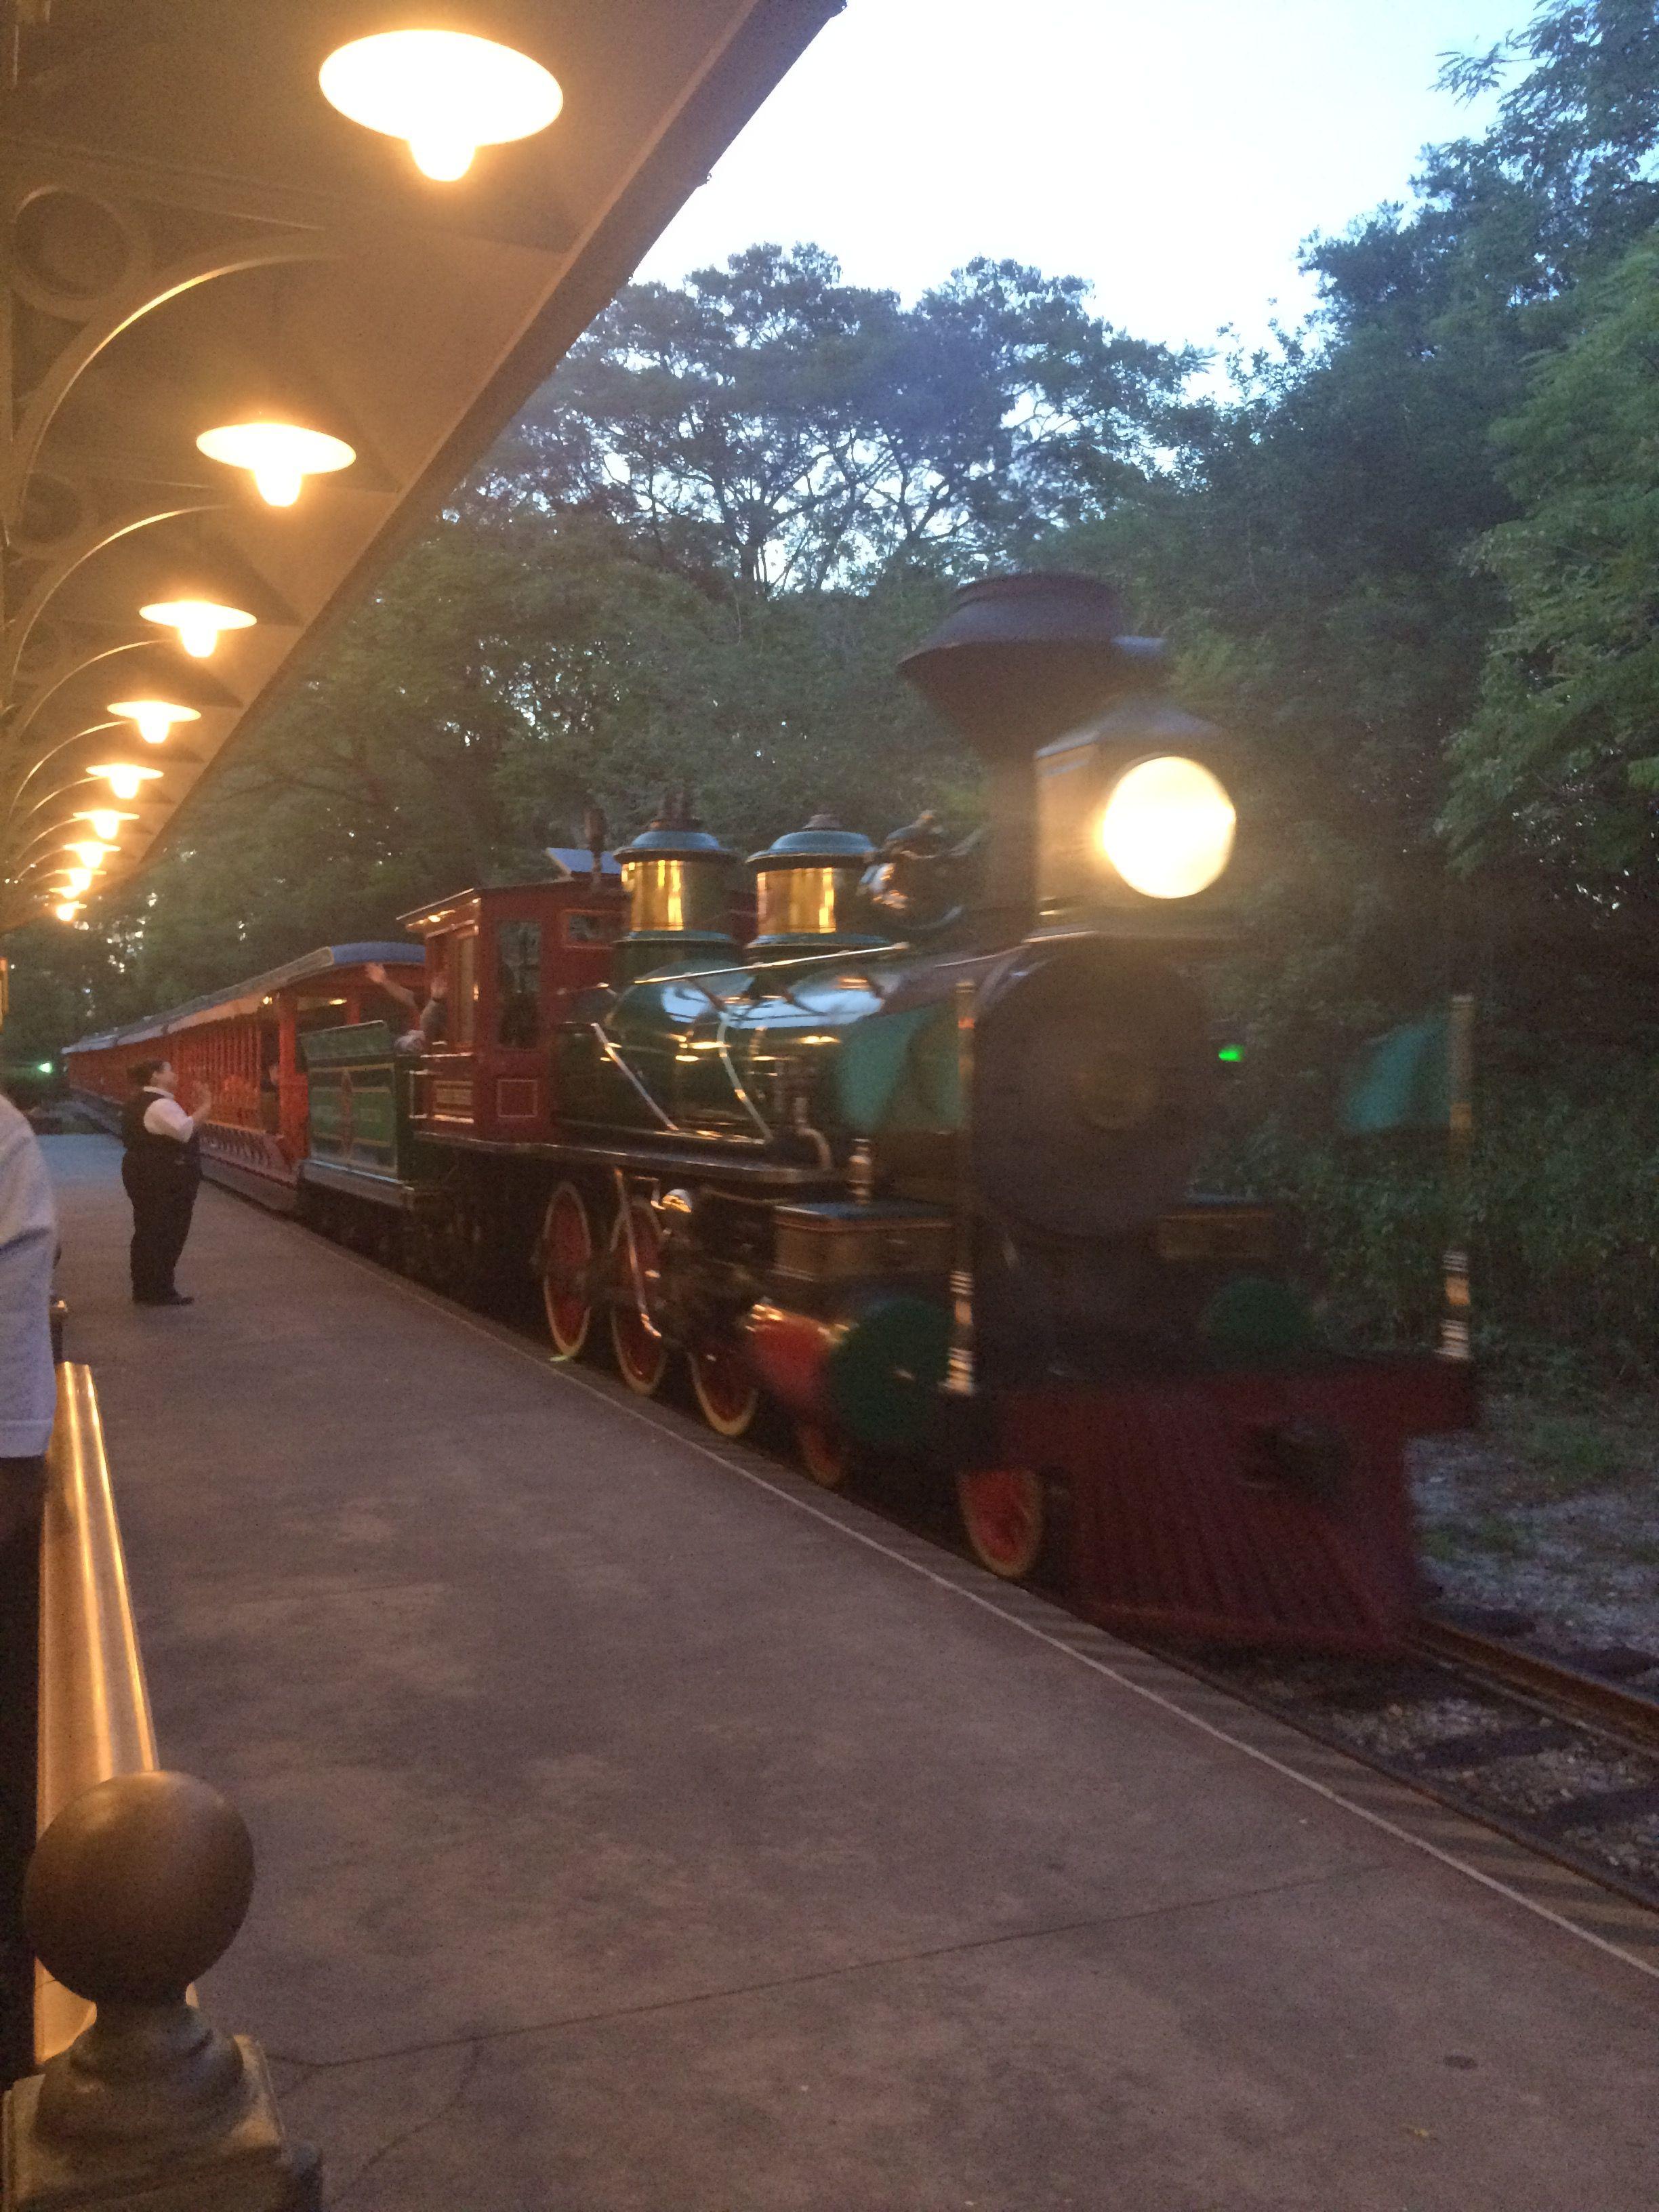 Train arriving to Fantasyland